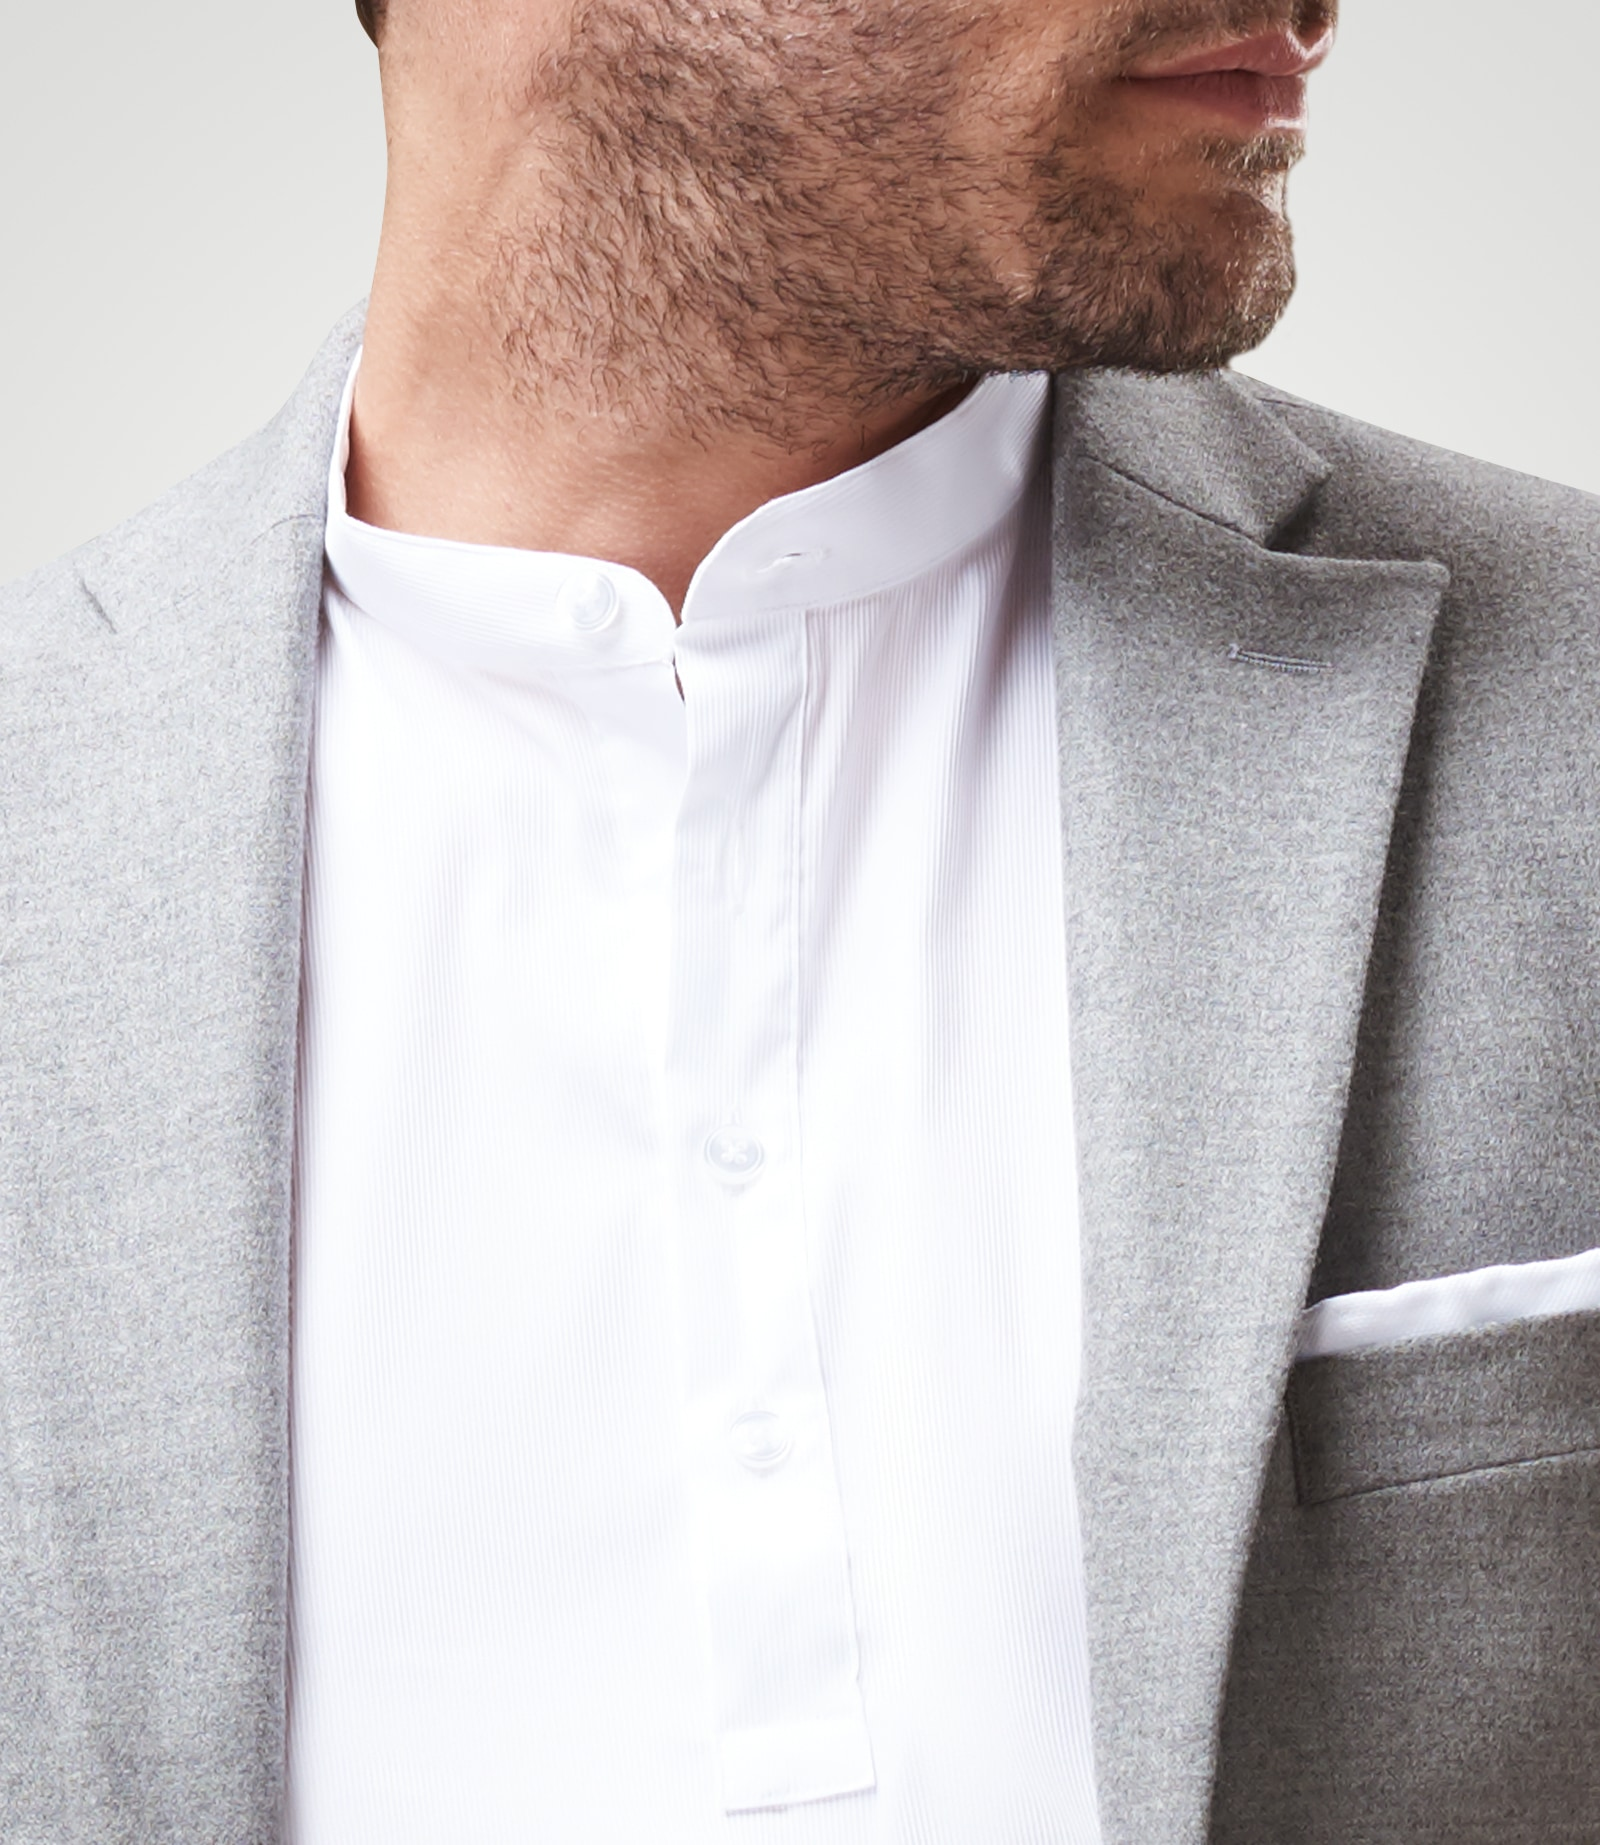 Comfort-Hemd - vielseitig kombinierbar